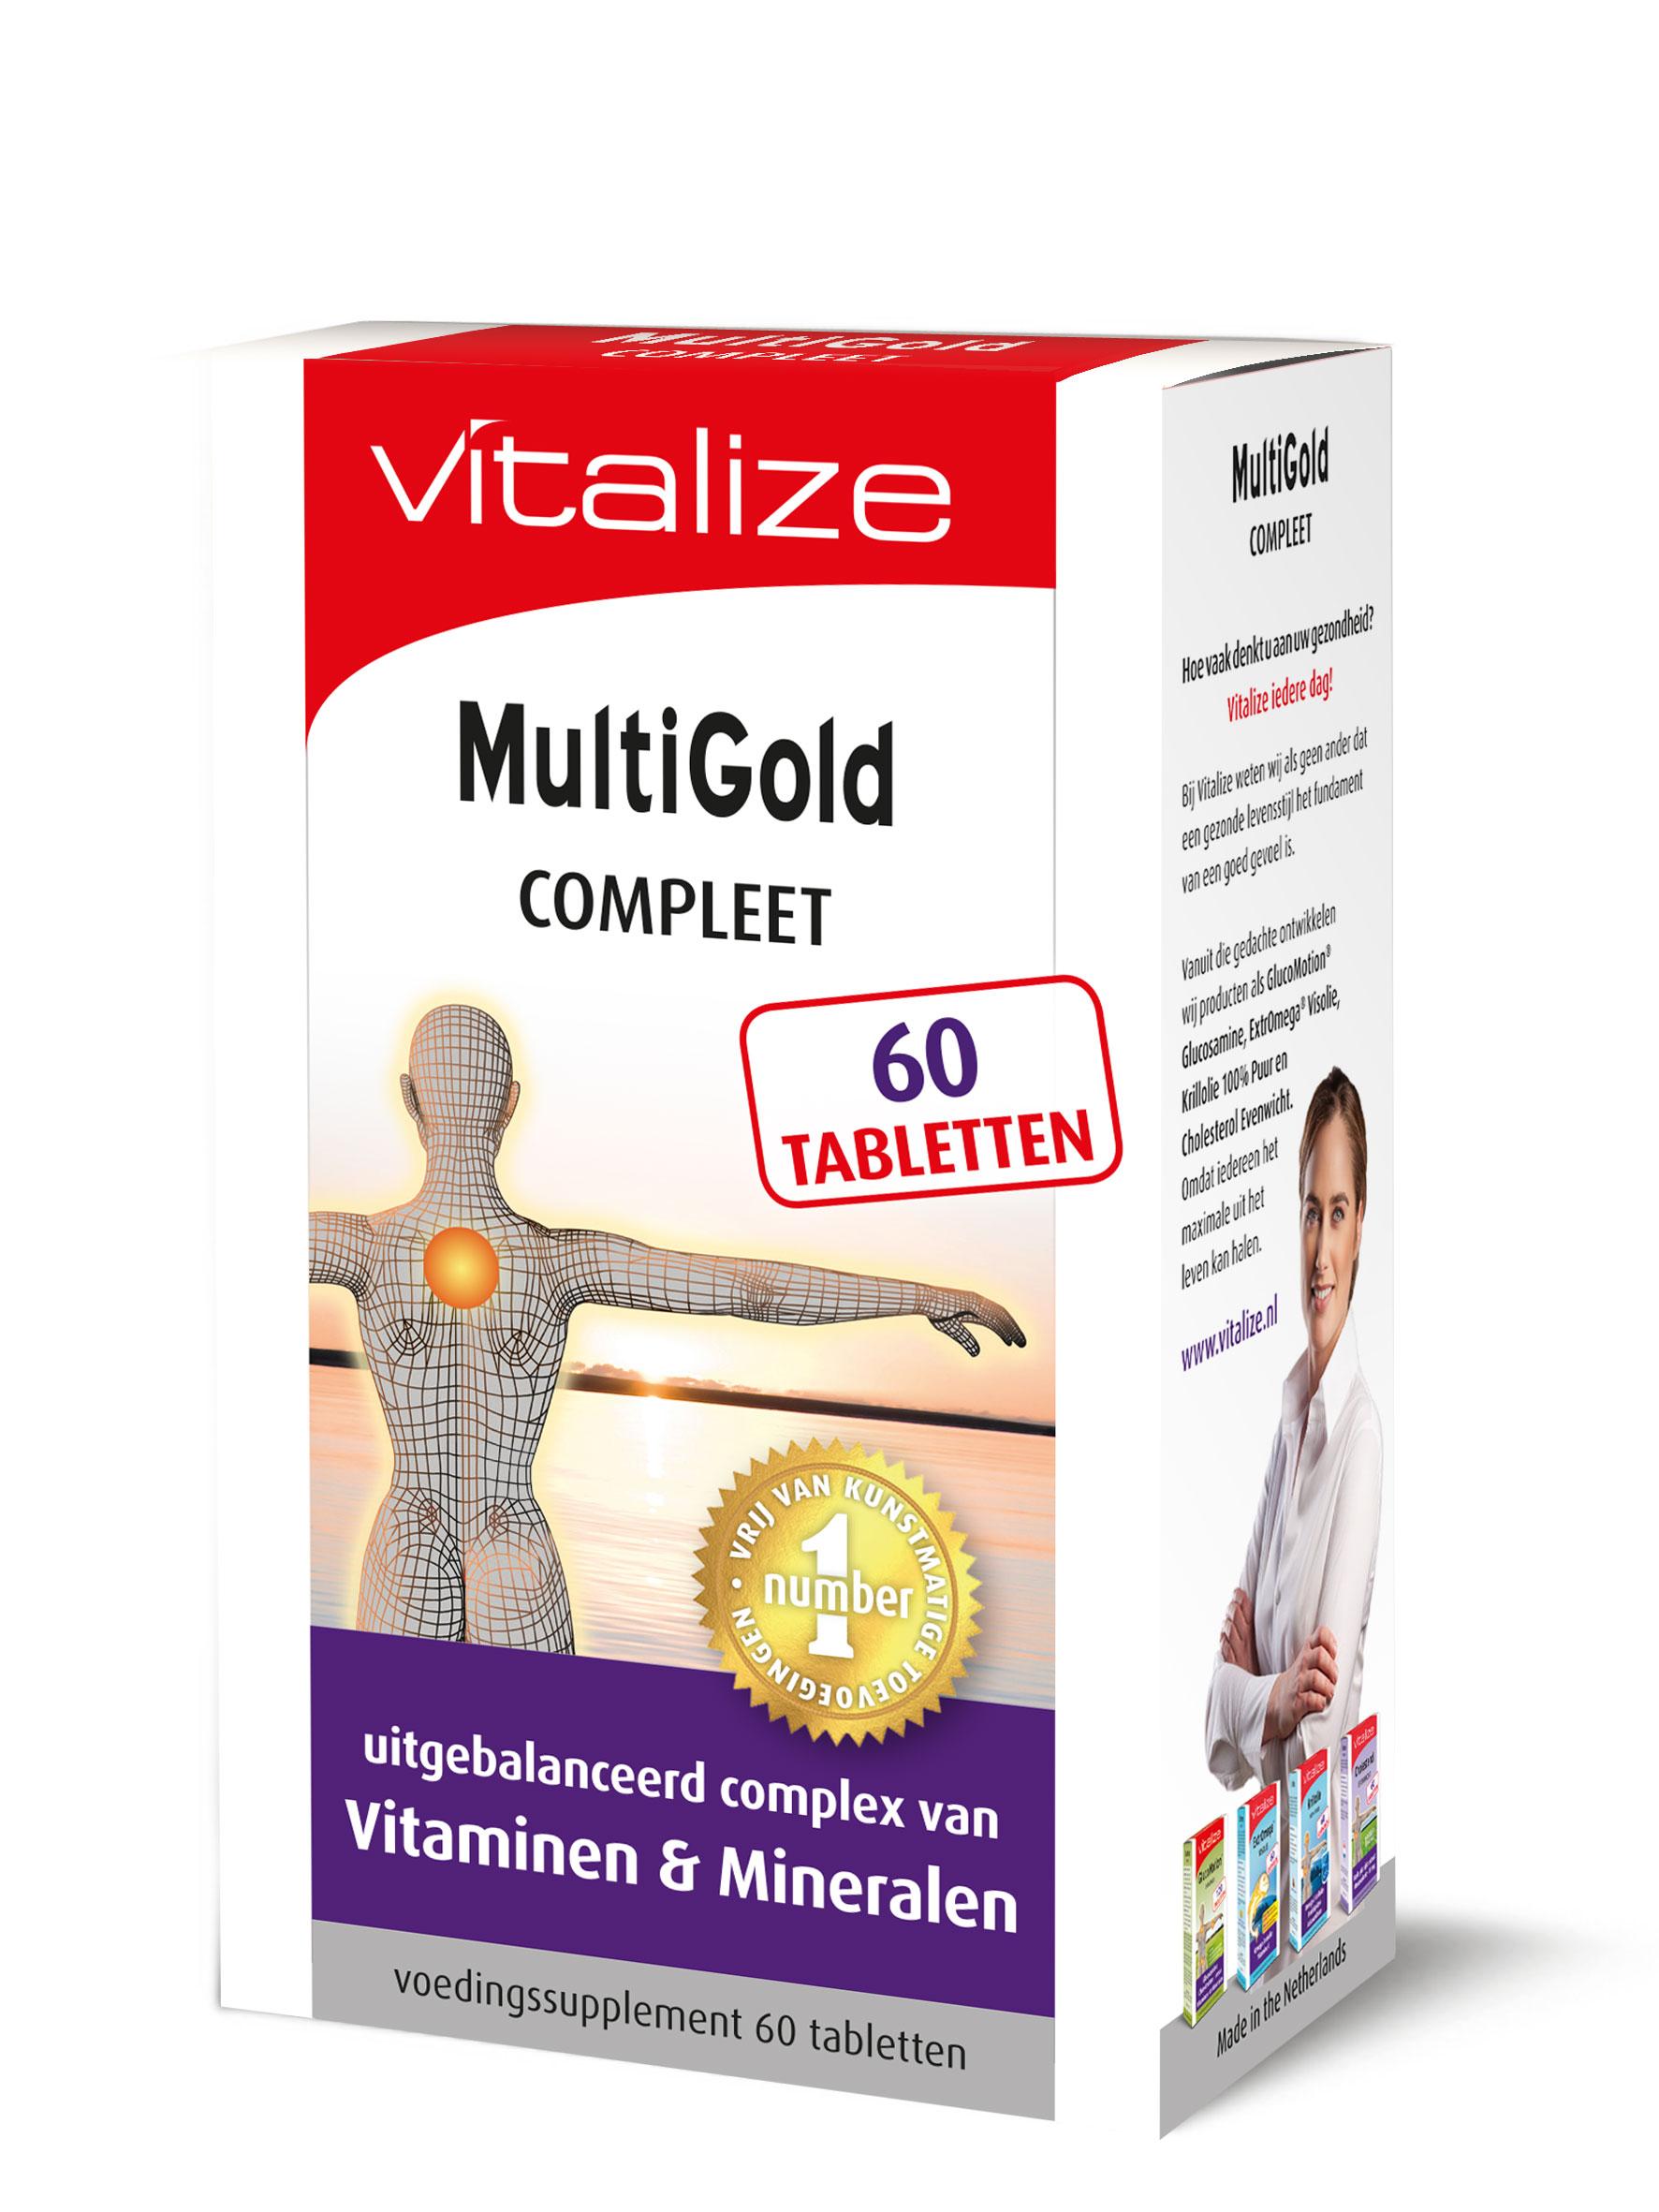 TIP: Vitalize MultiGold Compleet